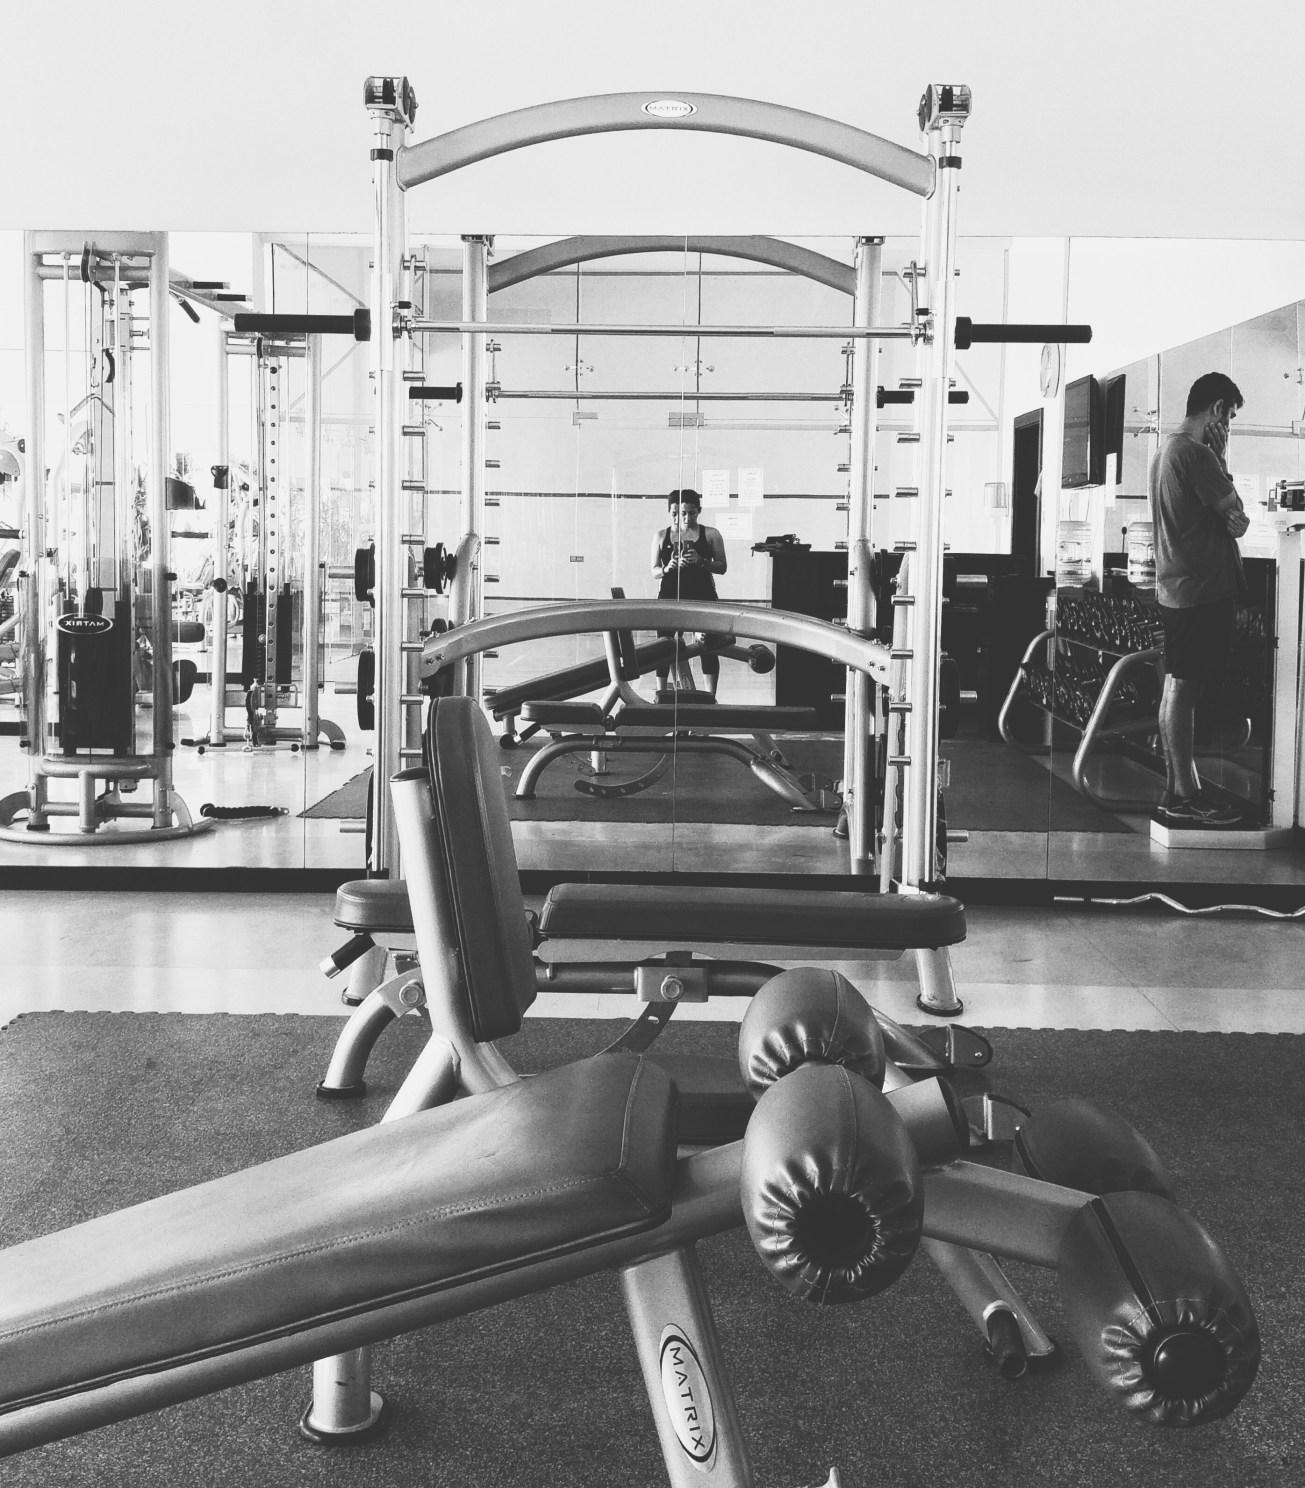 Kicking it at the gym